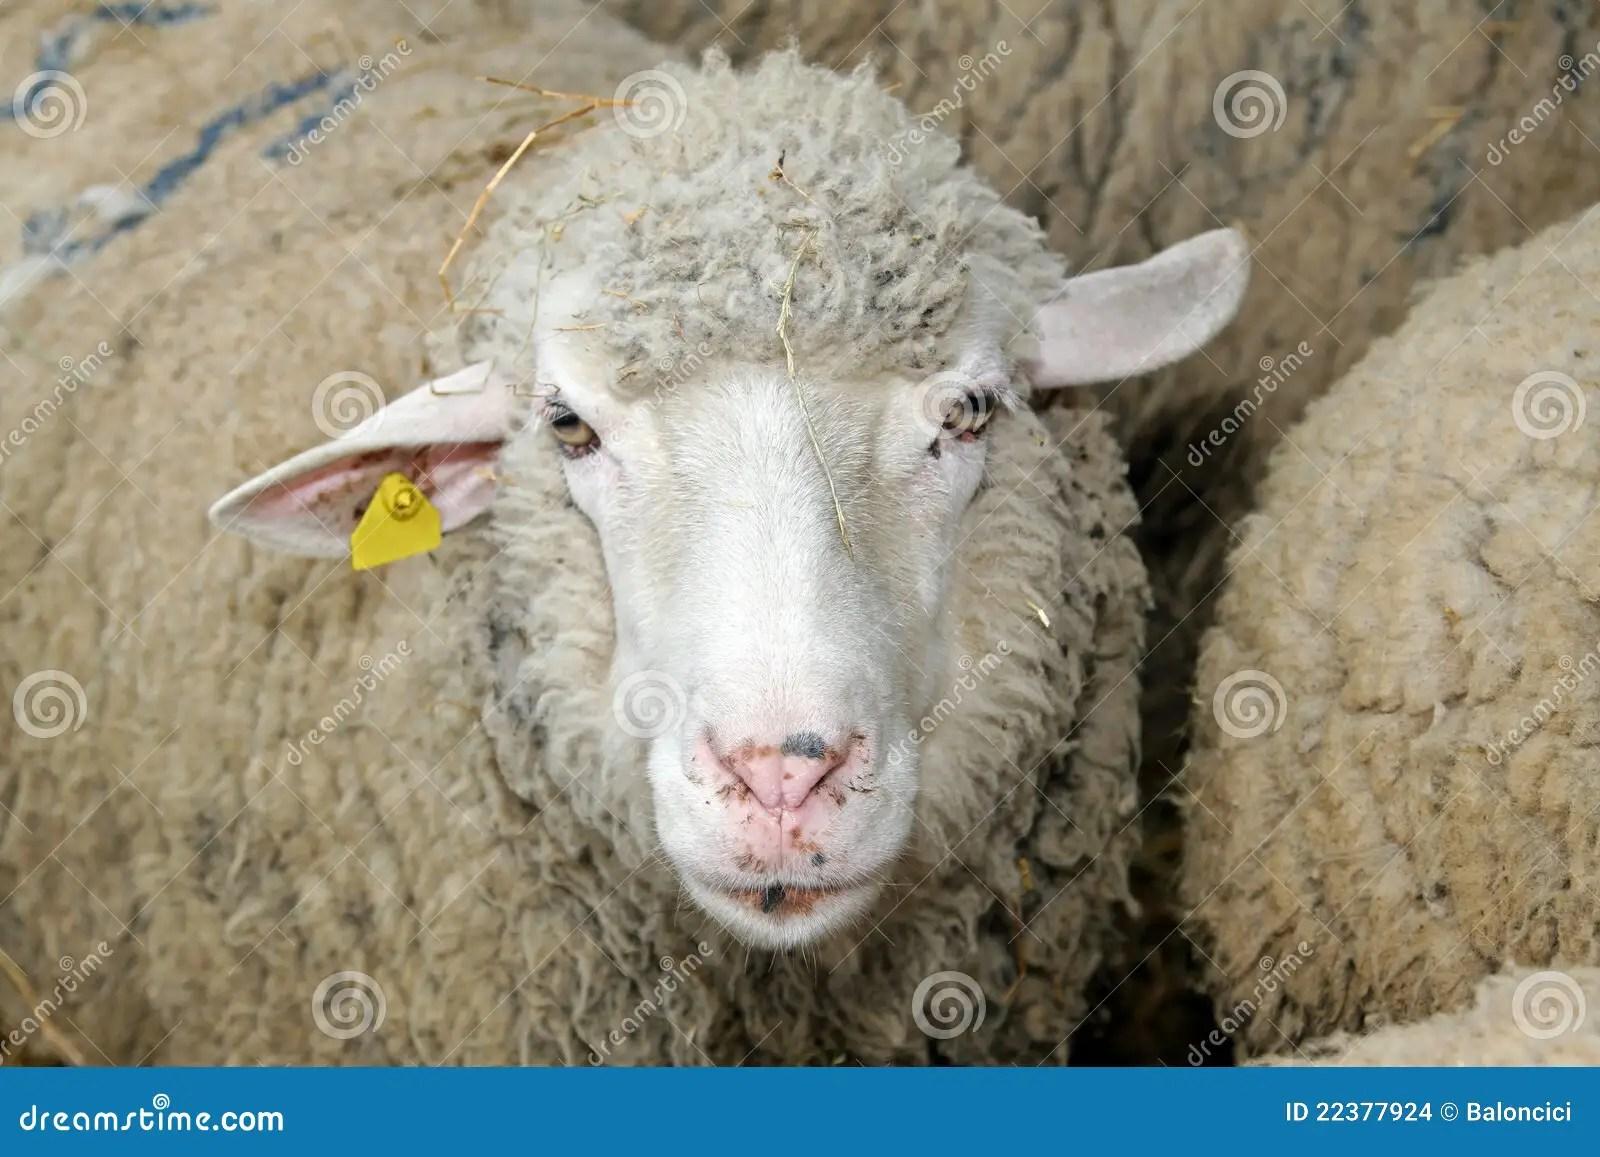 Sheep Head Stock Photo Image Of Livestock Head Mammal